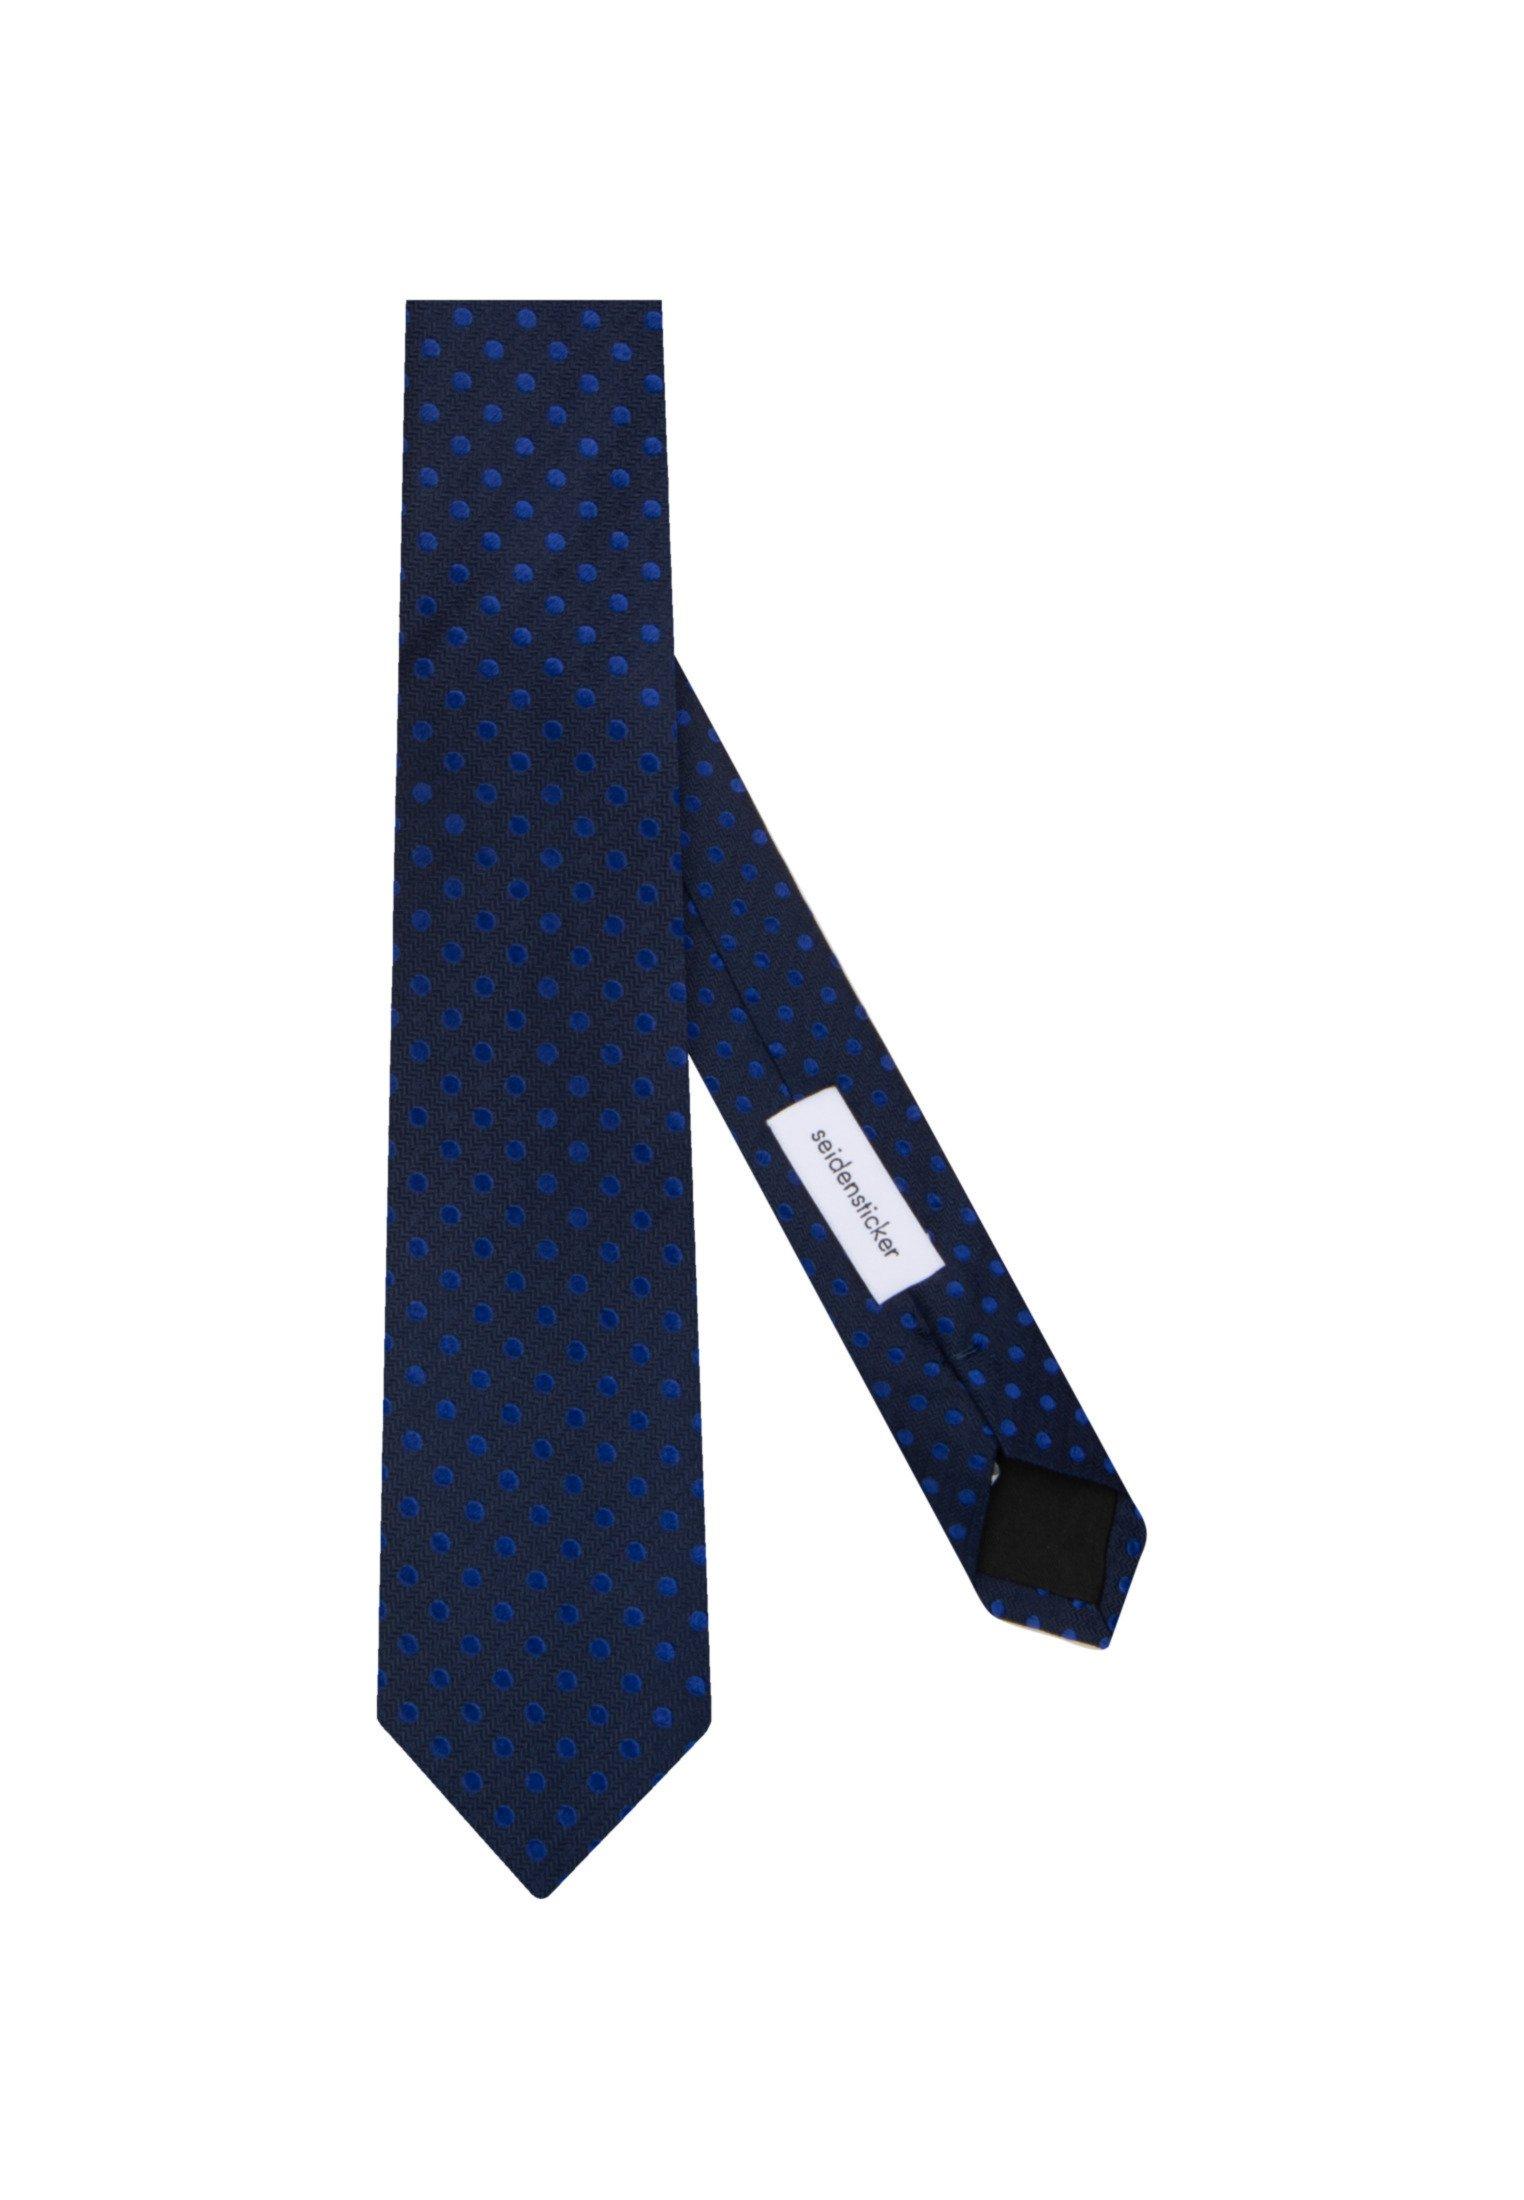 Seidensticker Krawatte - mittelblau/blau - Herrenaccessoires XEj6d